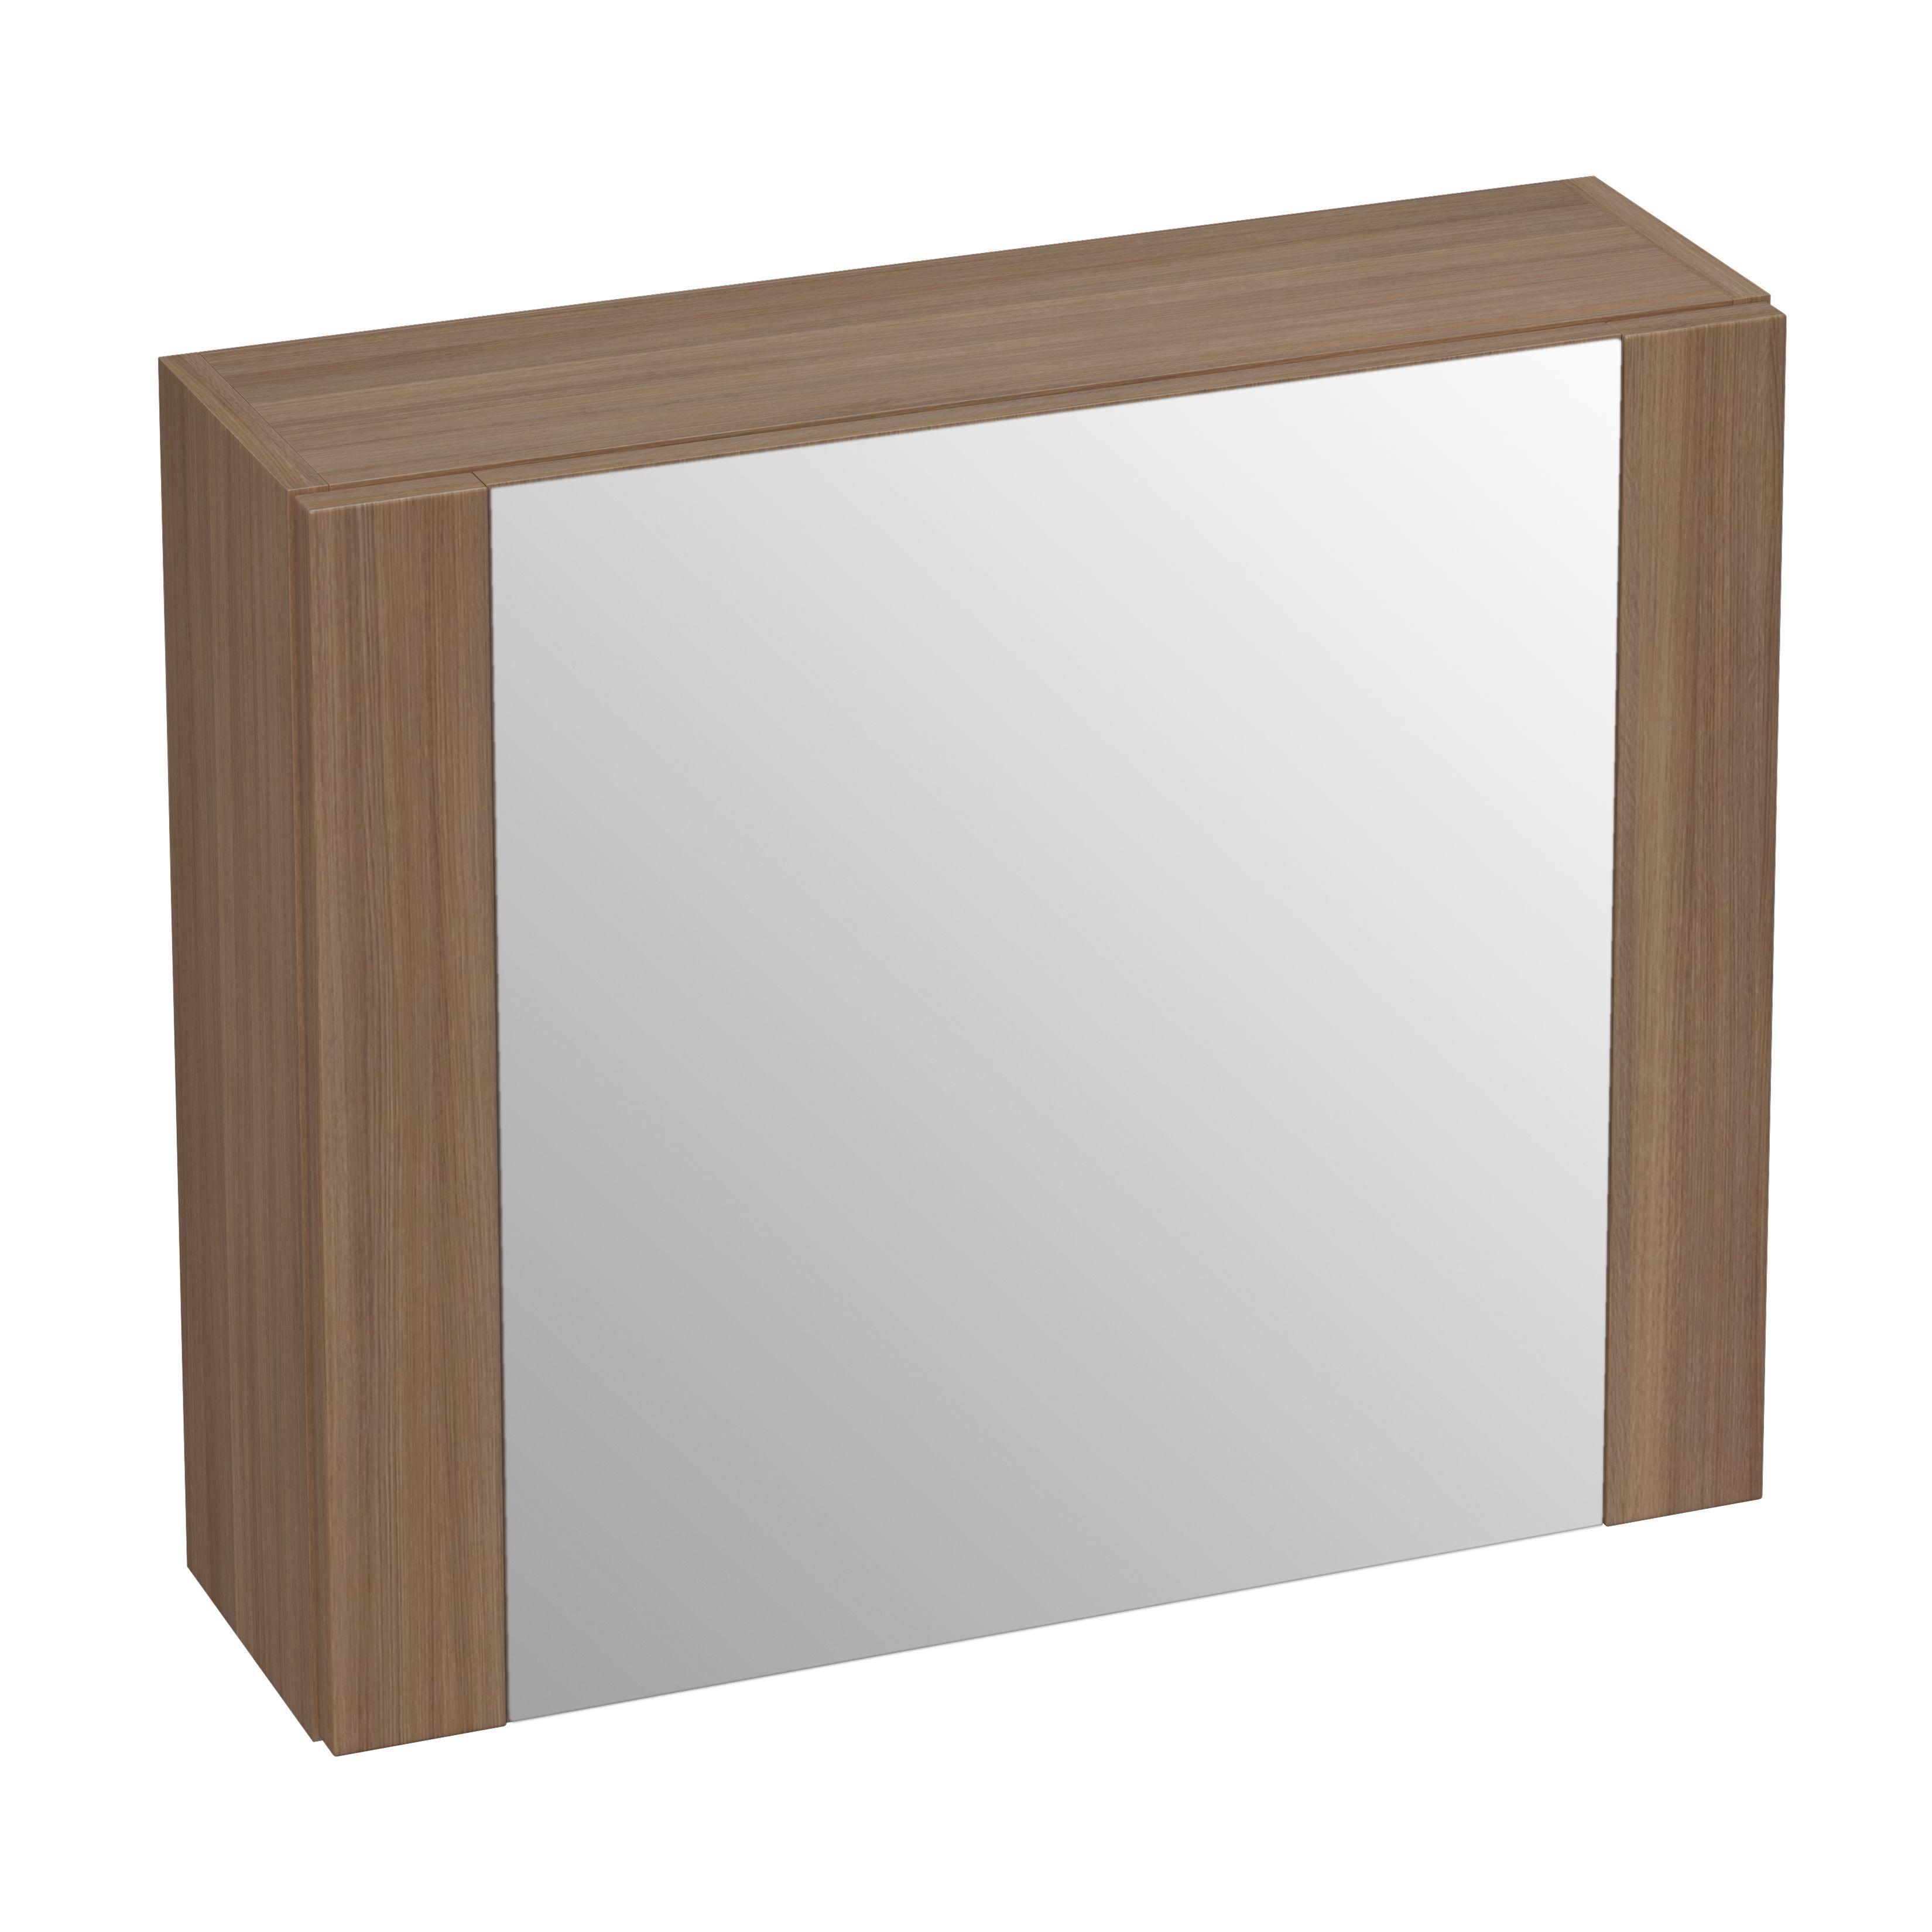 Cooke and lewis bathroom mirrors - Cooke Lewis Romana Single Door Oak Effect Medium Mirror Cabinet Departments Diy At B Q